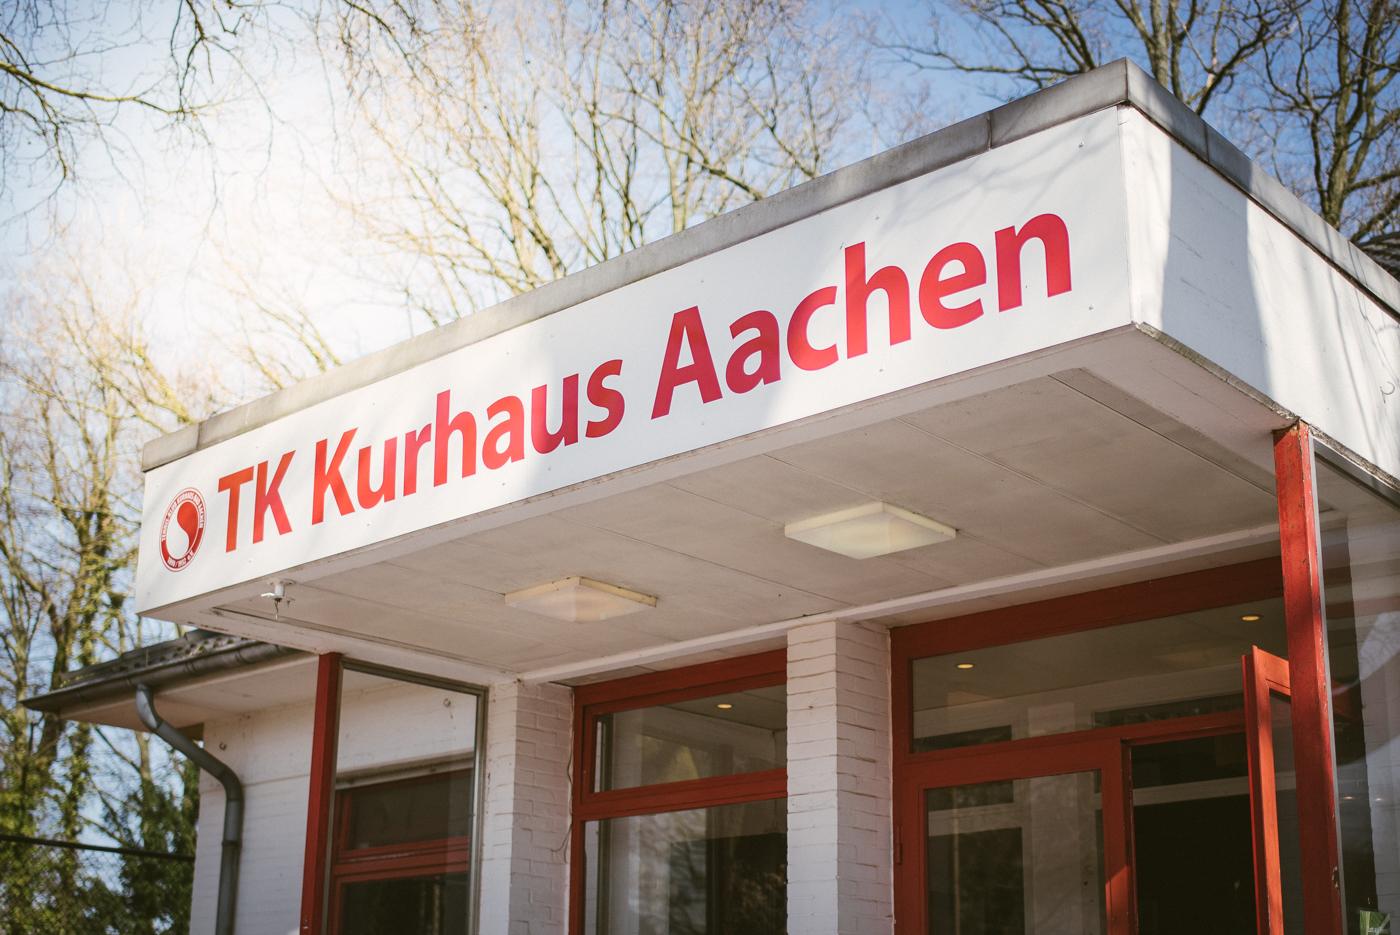 Tk Kurhaus